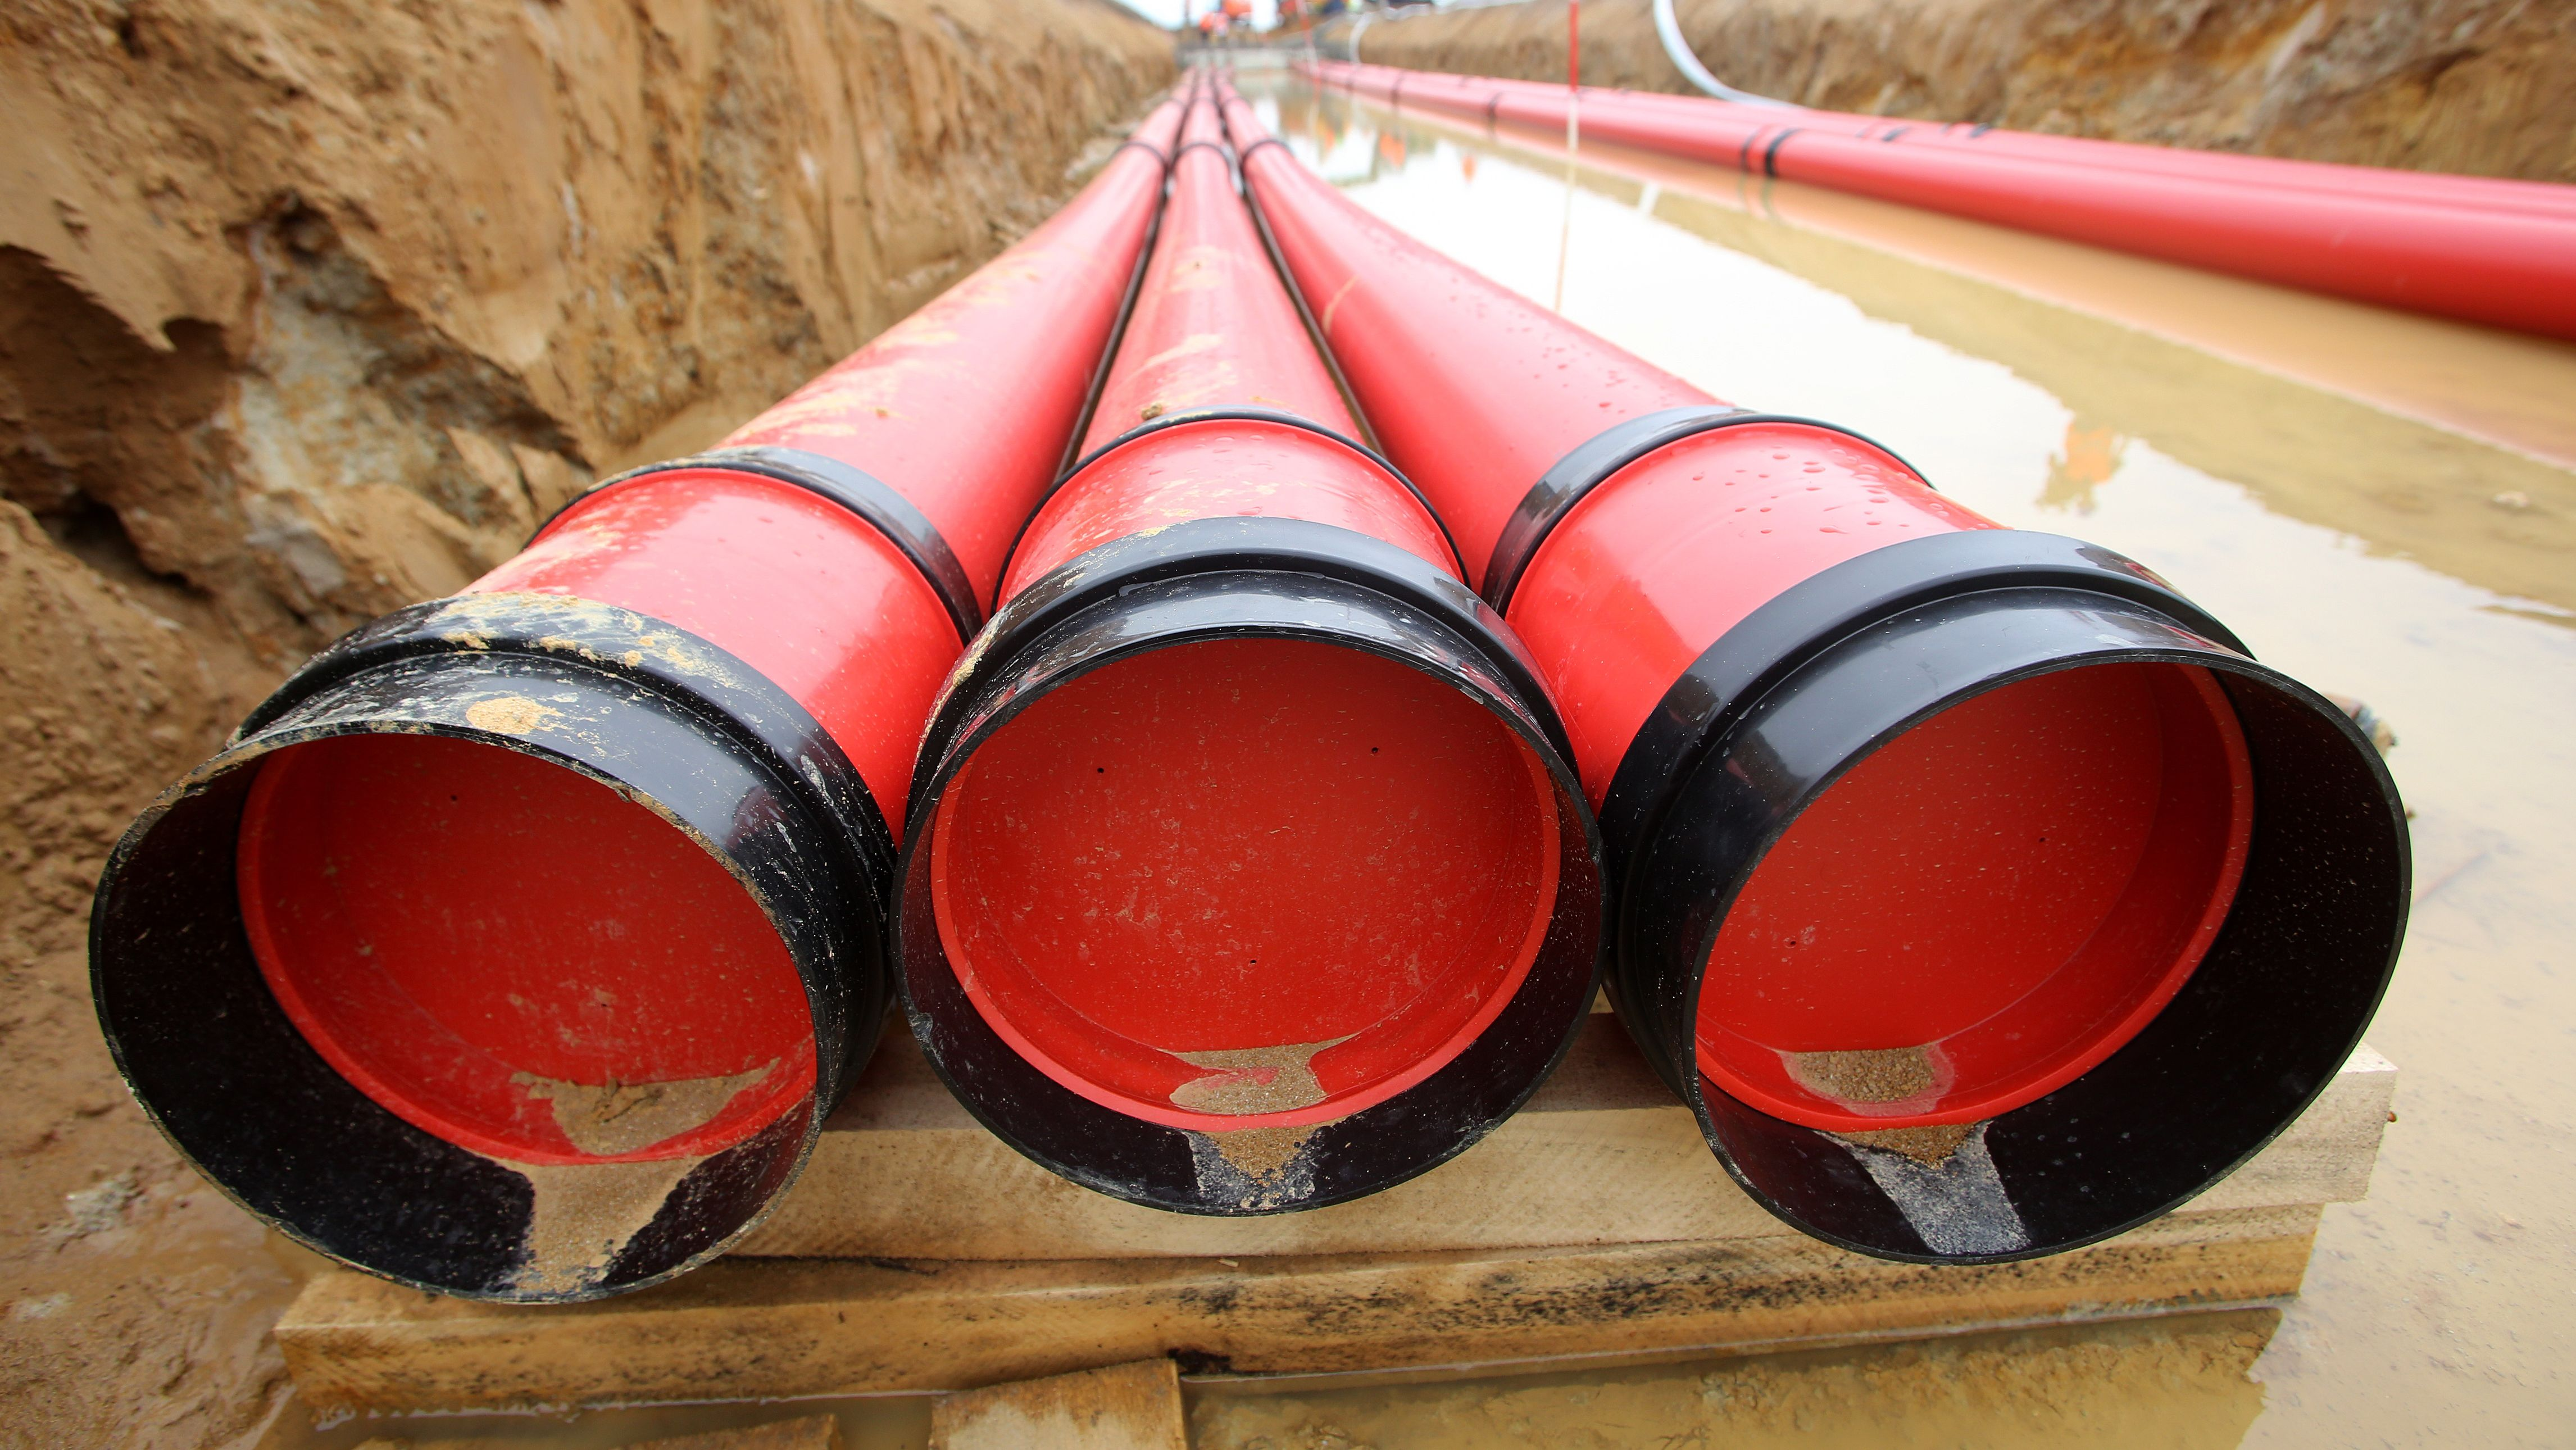 Rohre, in denen Erdkabel Strom transportieren sollen (Symbolbild)